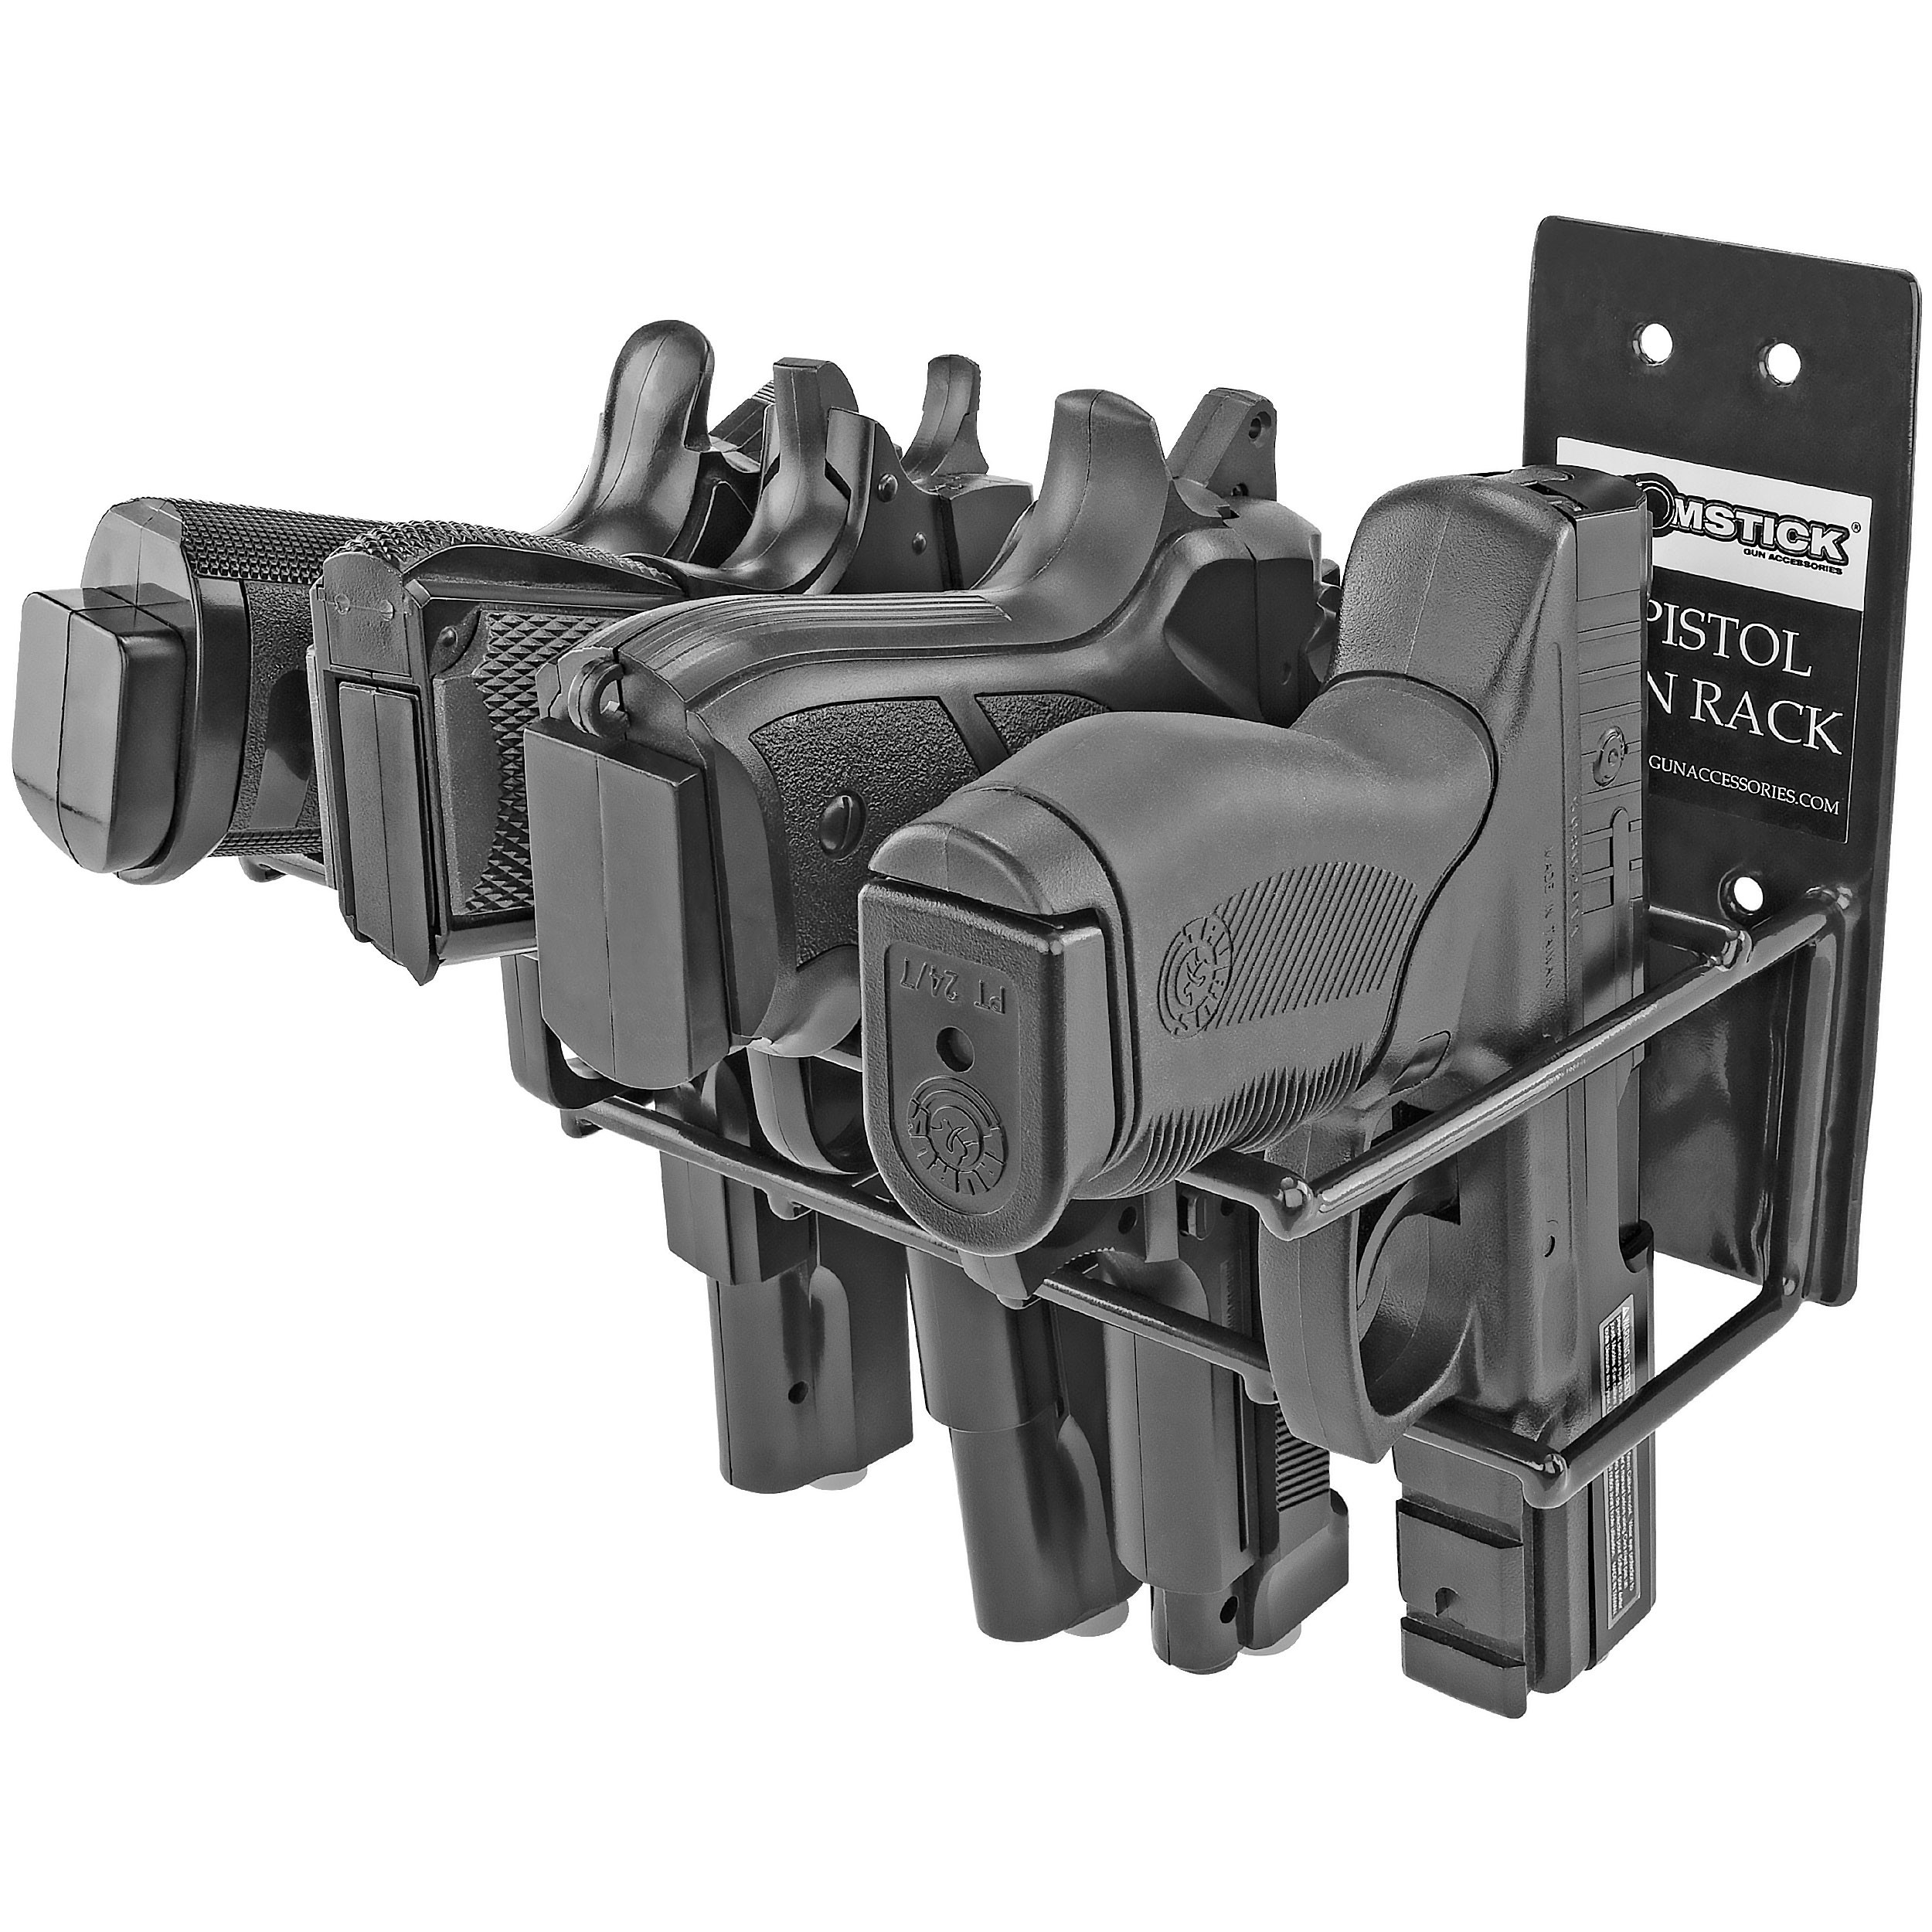 BOOMSTICK Gun Accessories 4 Gun Handgun Black Vinyl Coated Pistol Wall Mount Rack